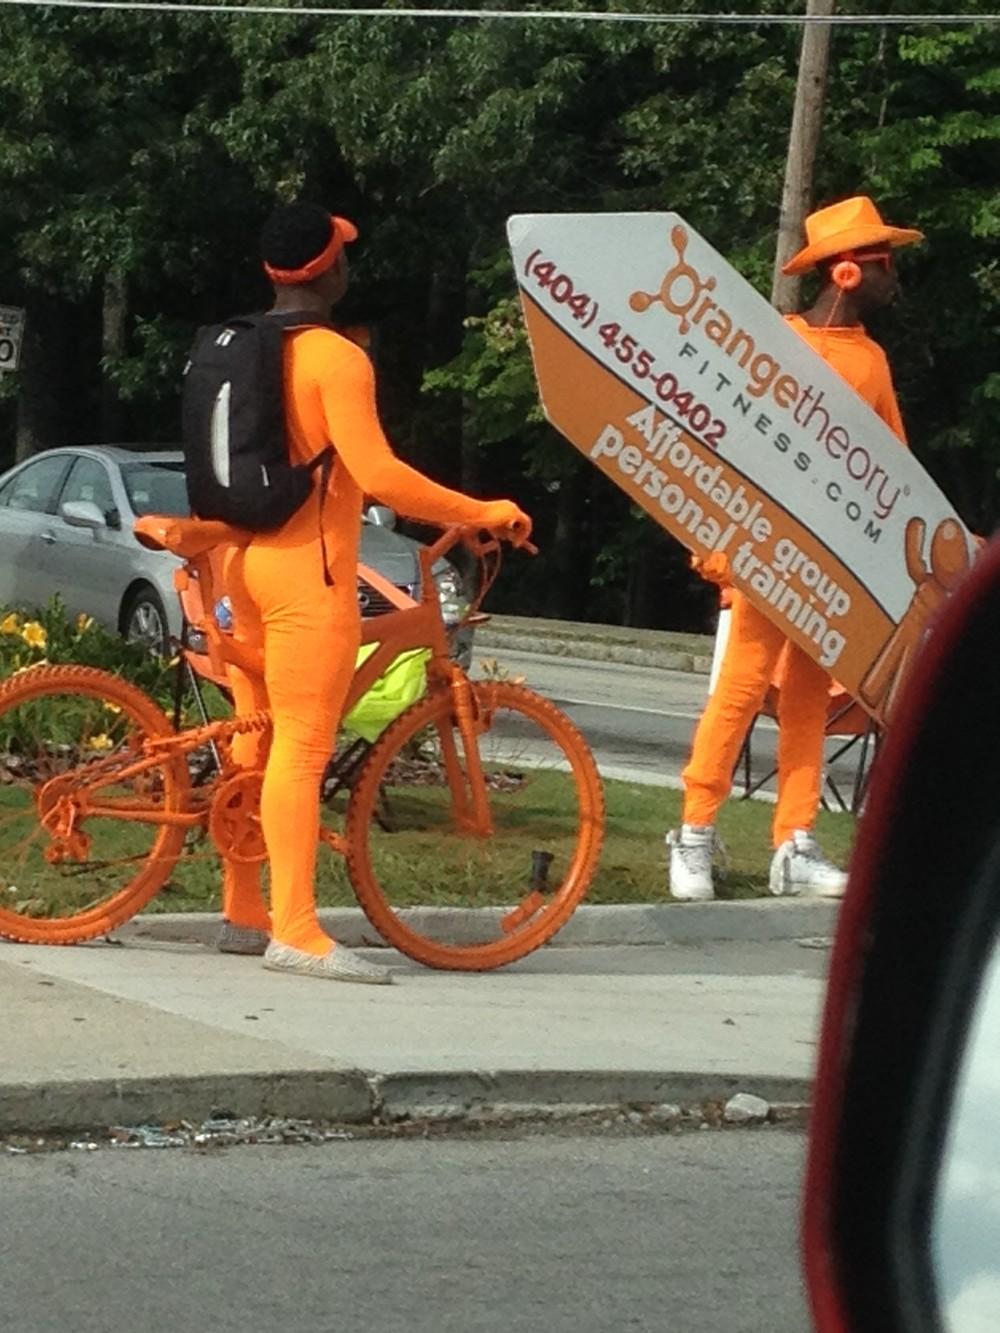 Successful Street Marketing